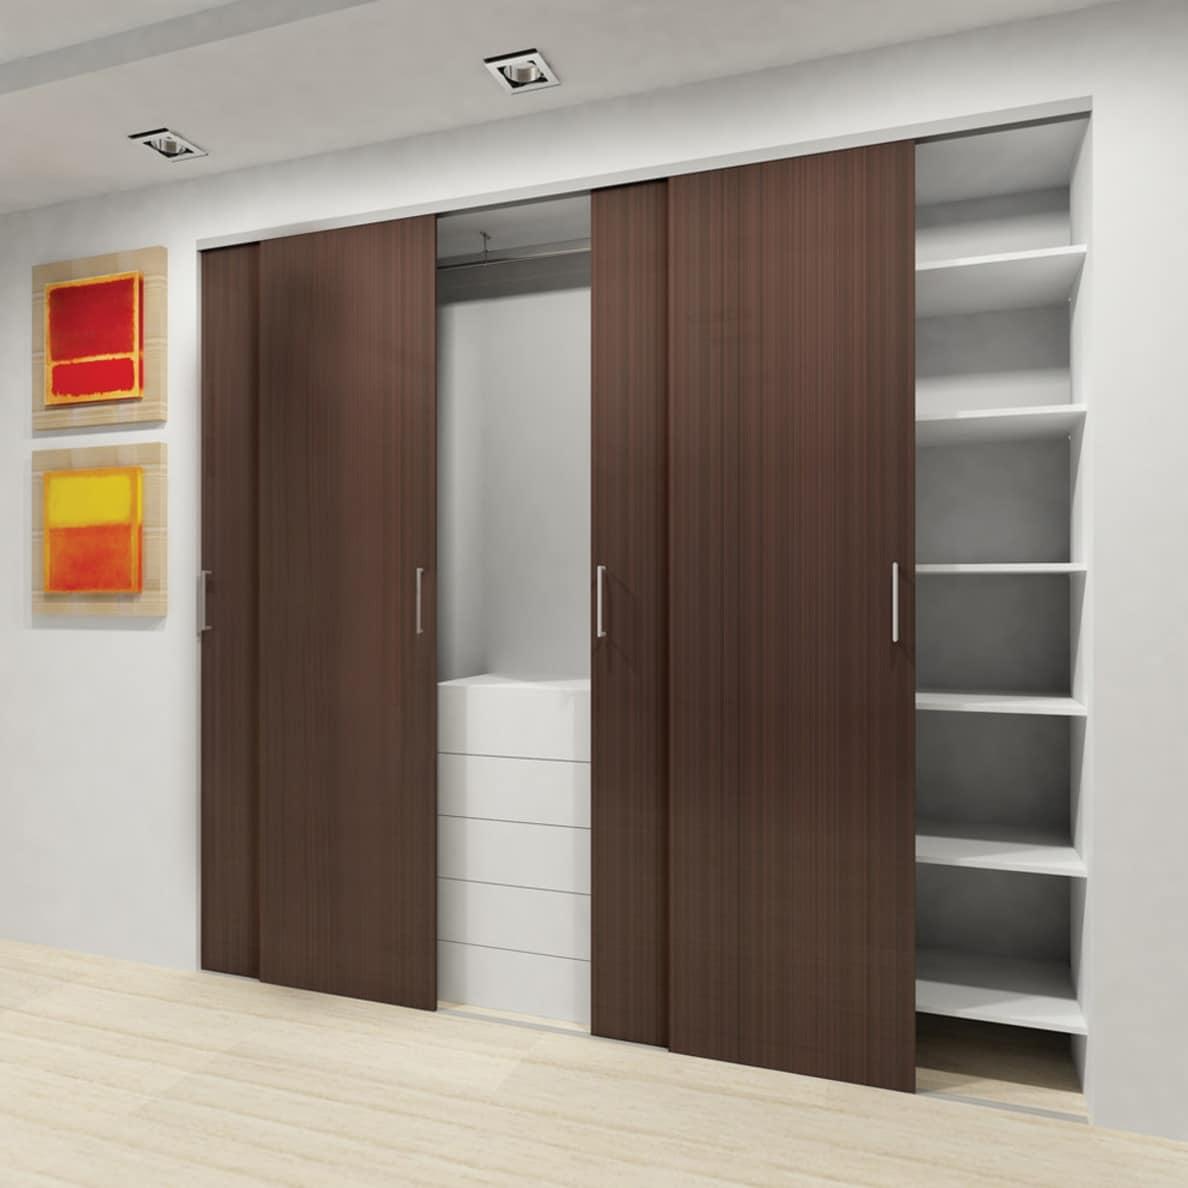 Types Of Sliding Closet Doors Sliding Doors